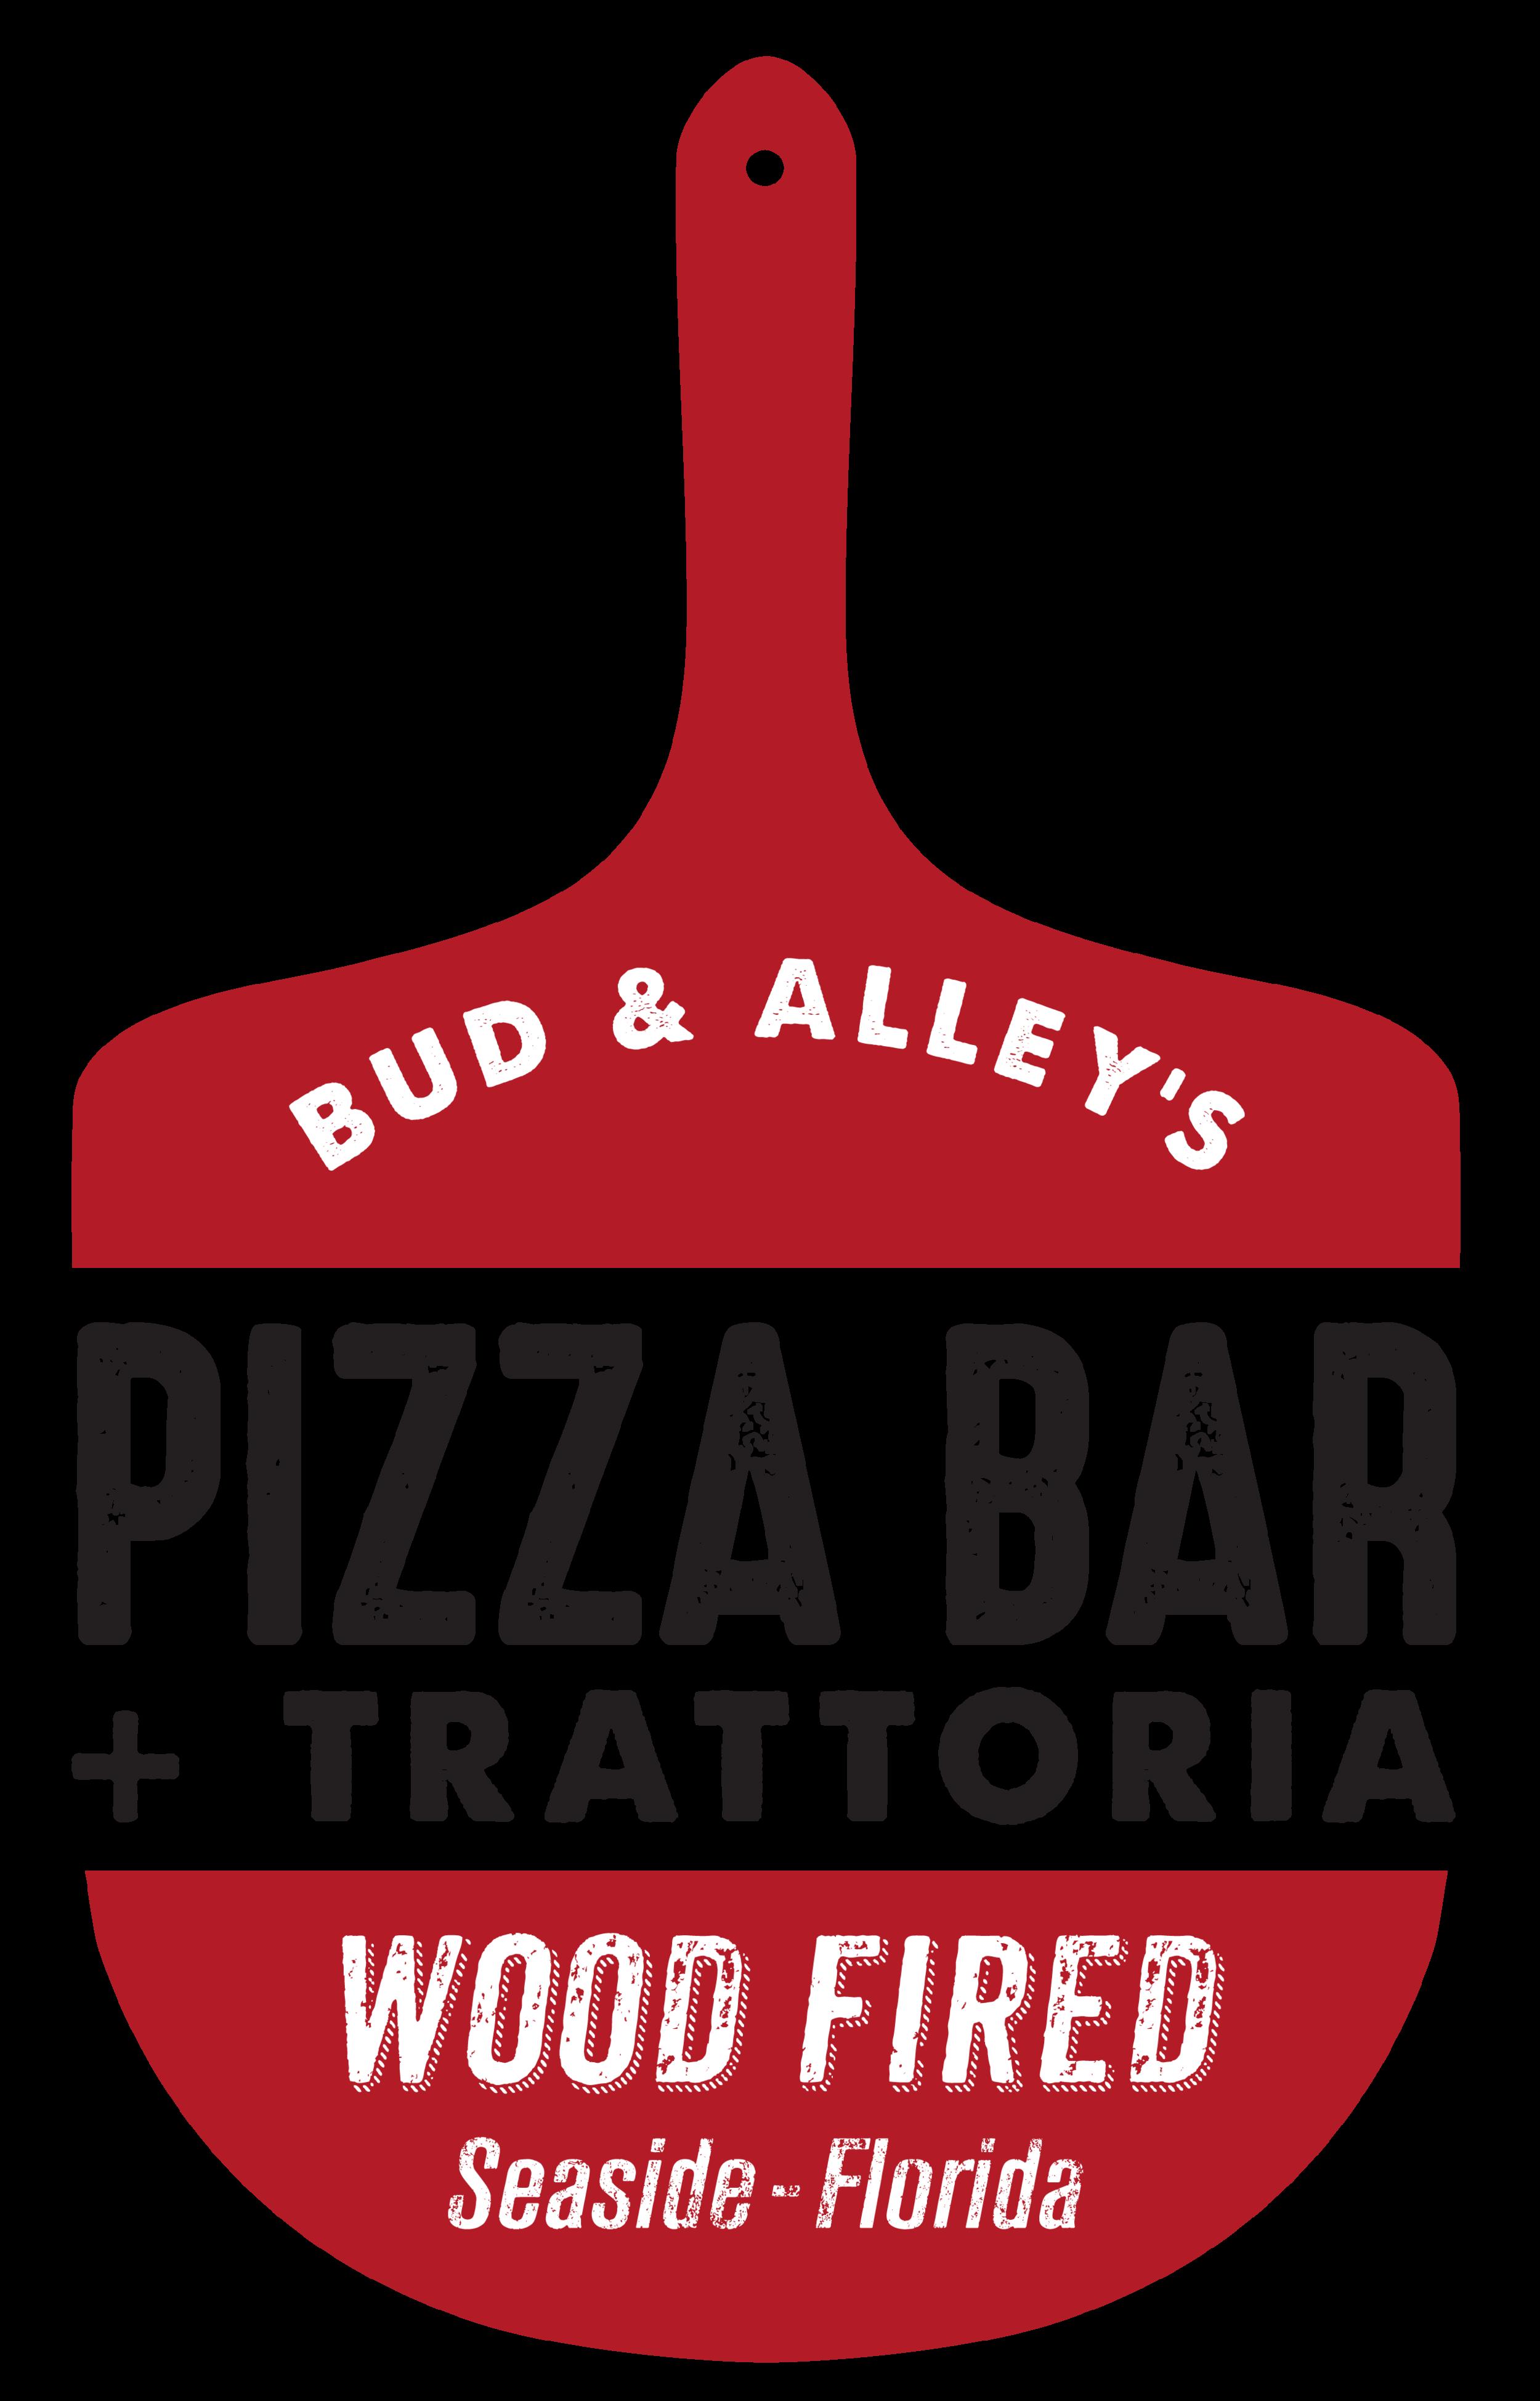 PizzaBar_seaside_logo.png